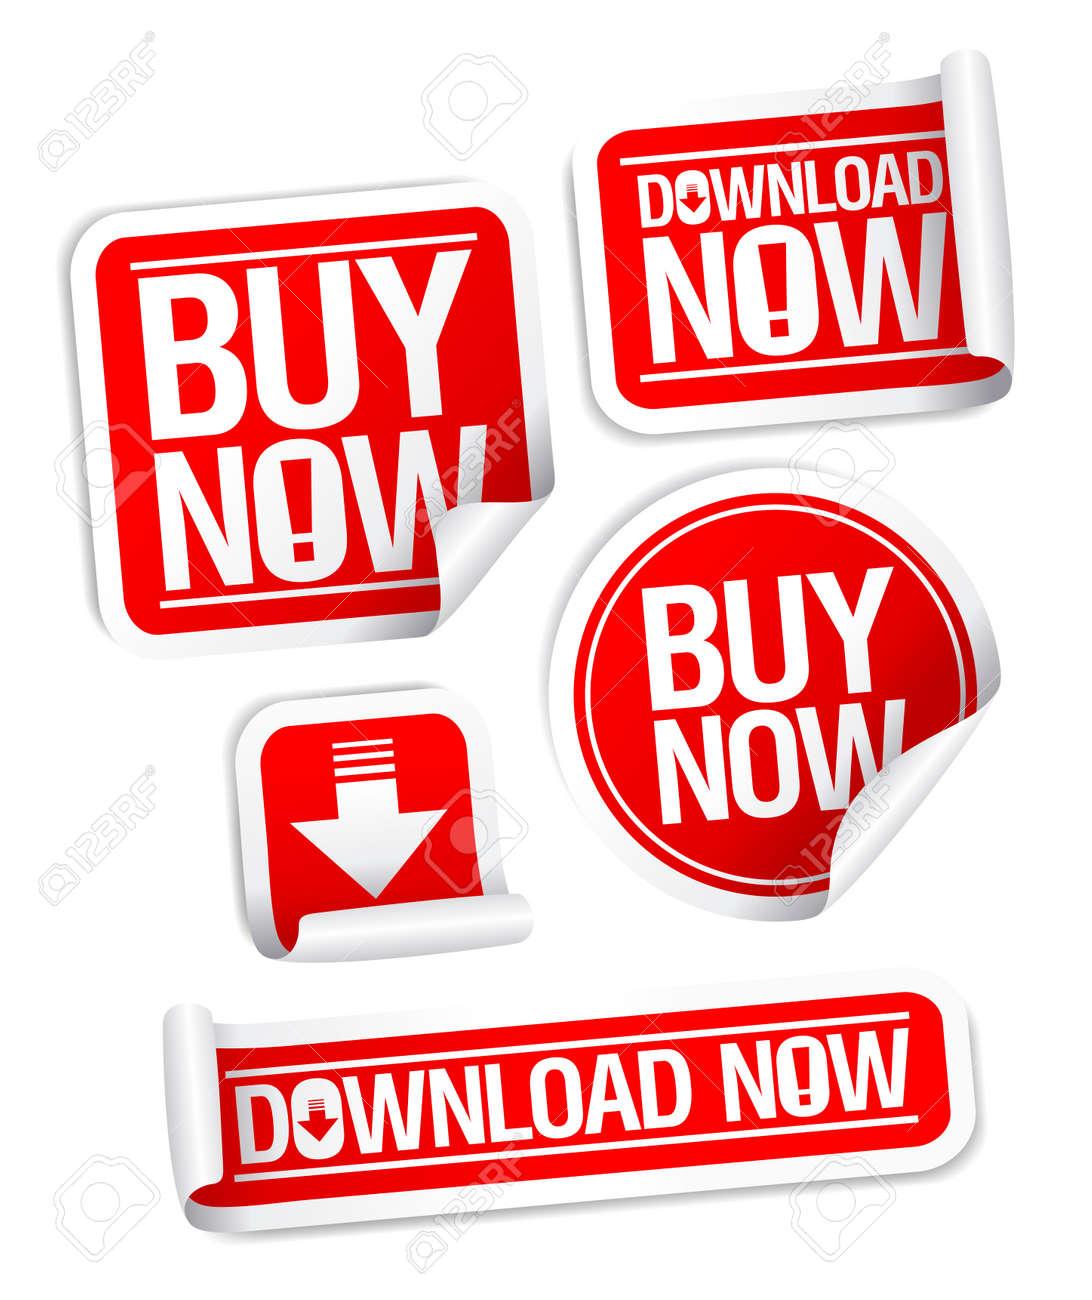 Buy Now, Download Now online store stickers set. Stock Vector - 8668971